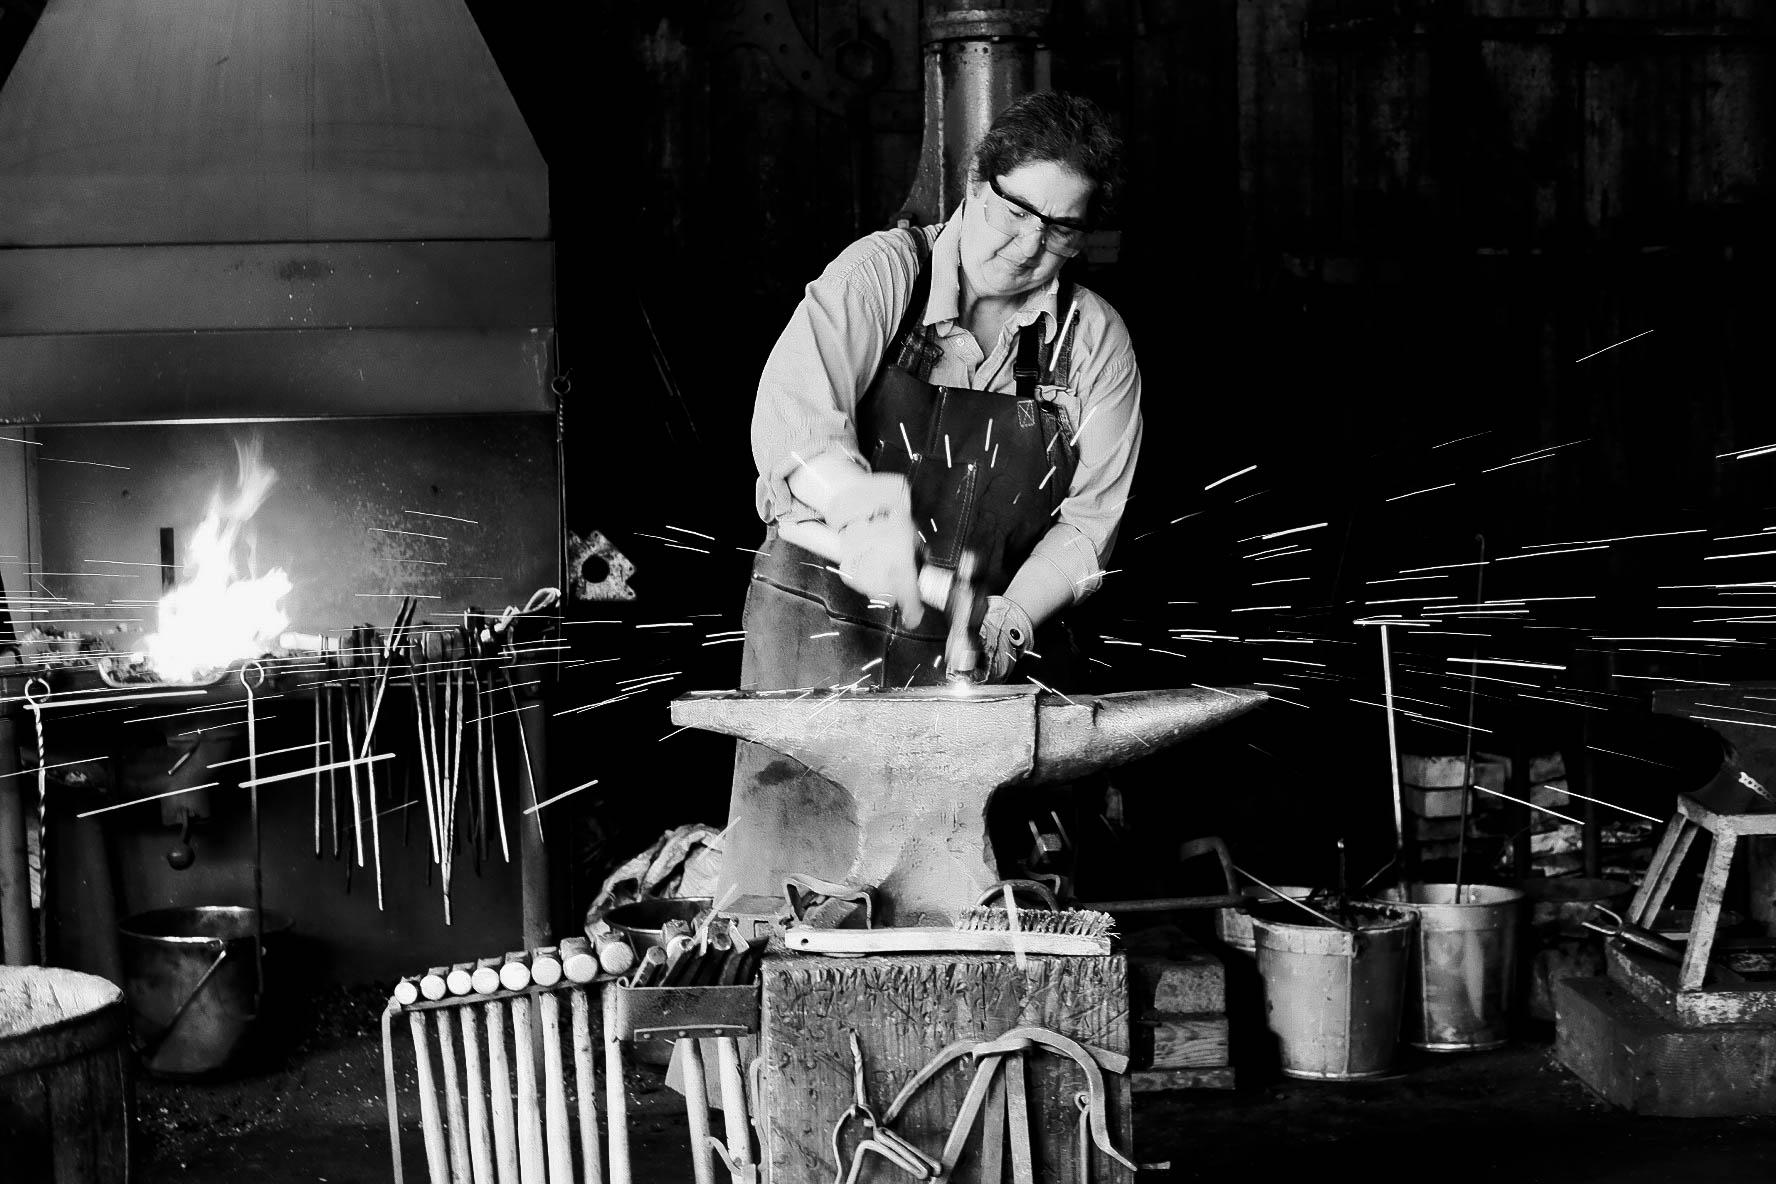 blacksmith, metal work, history, horseshoes